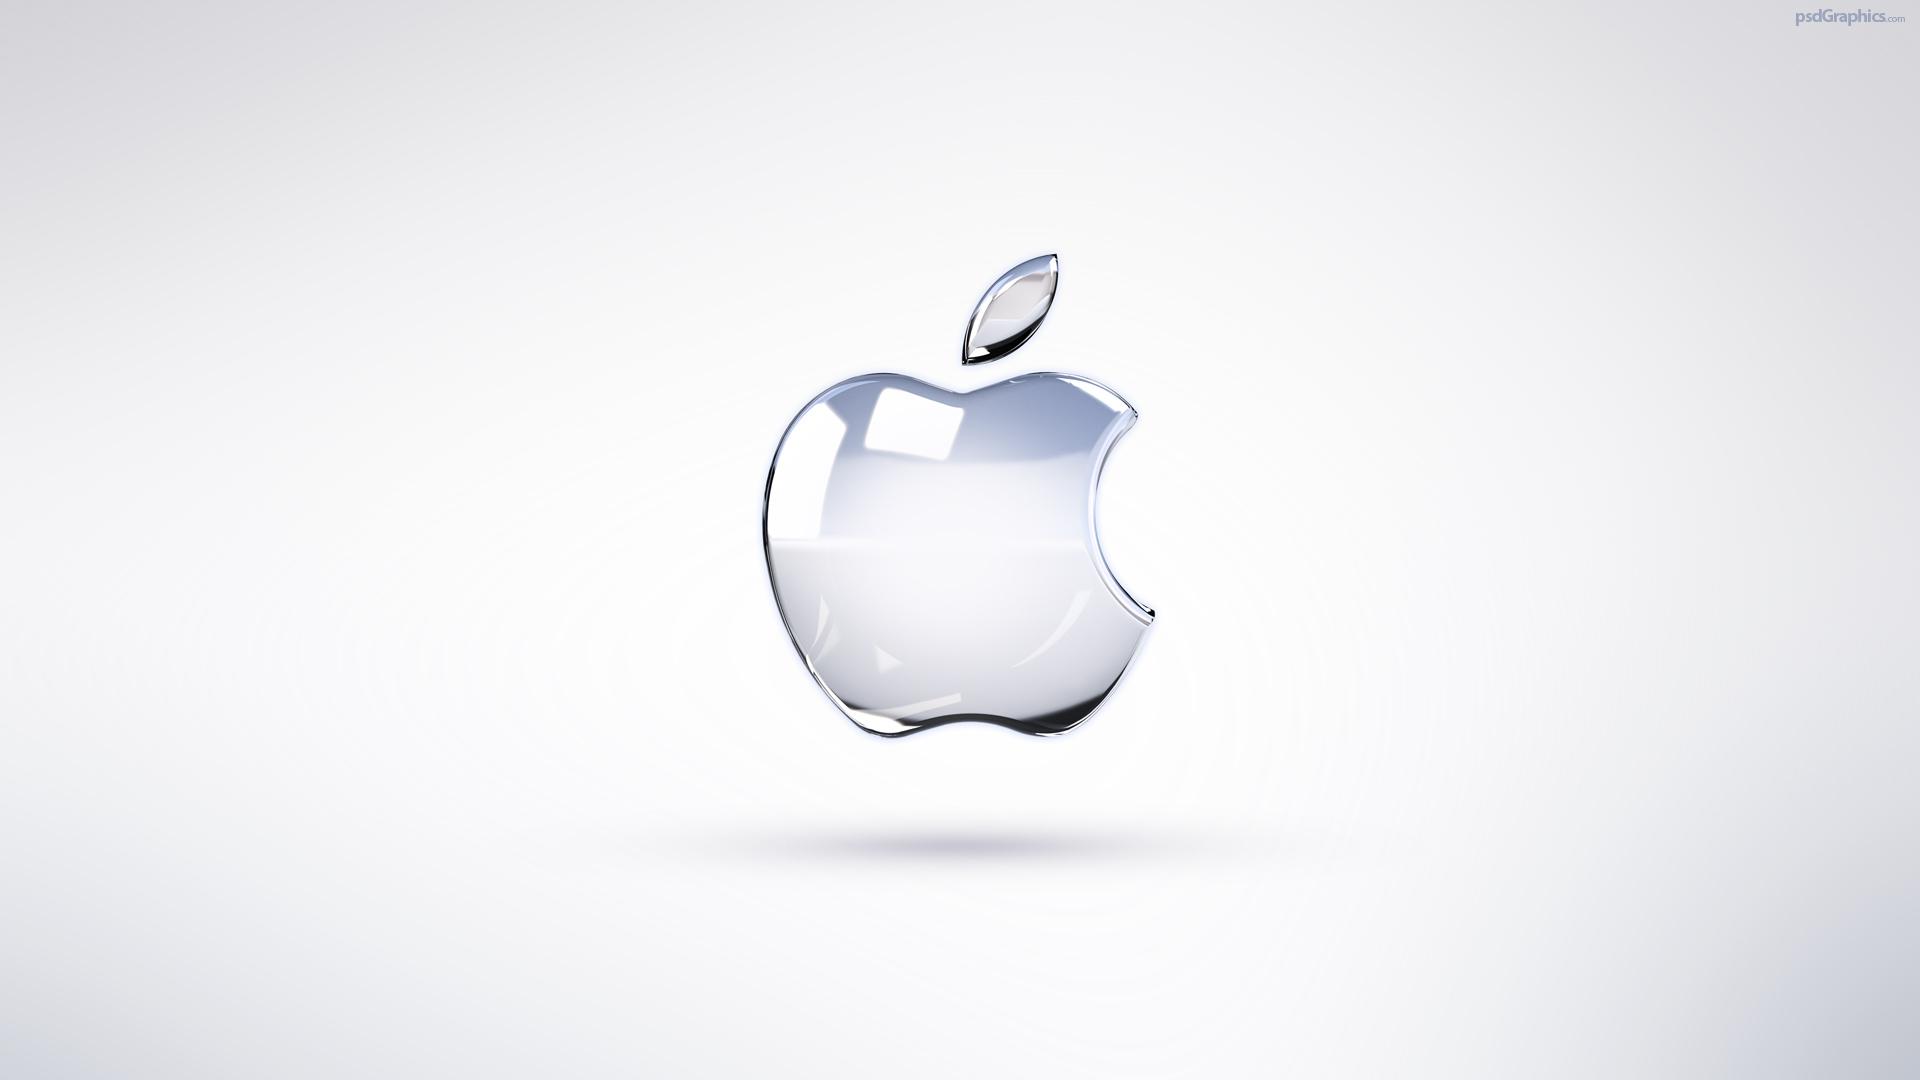 DOWNLOAD DESKTOP BACKGROUND: Apple Background HD 1080p - FULL SIZE ...